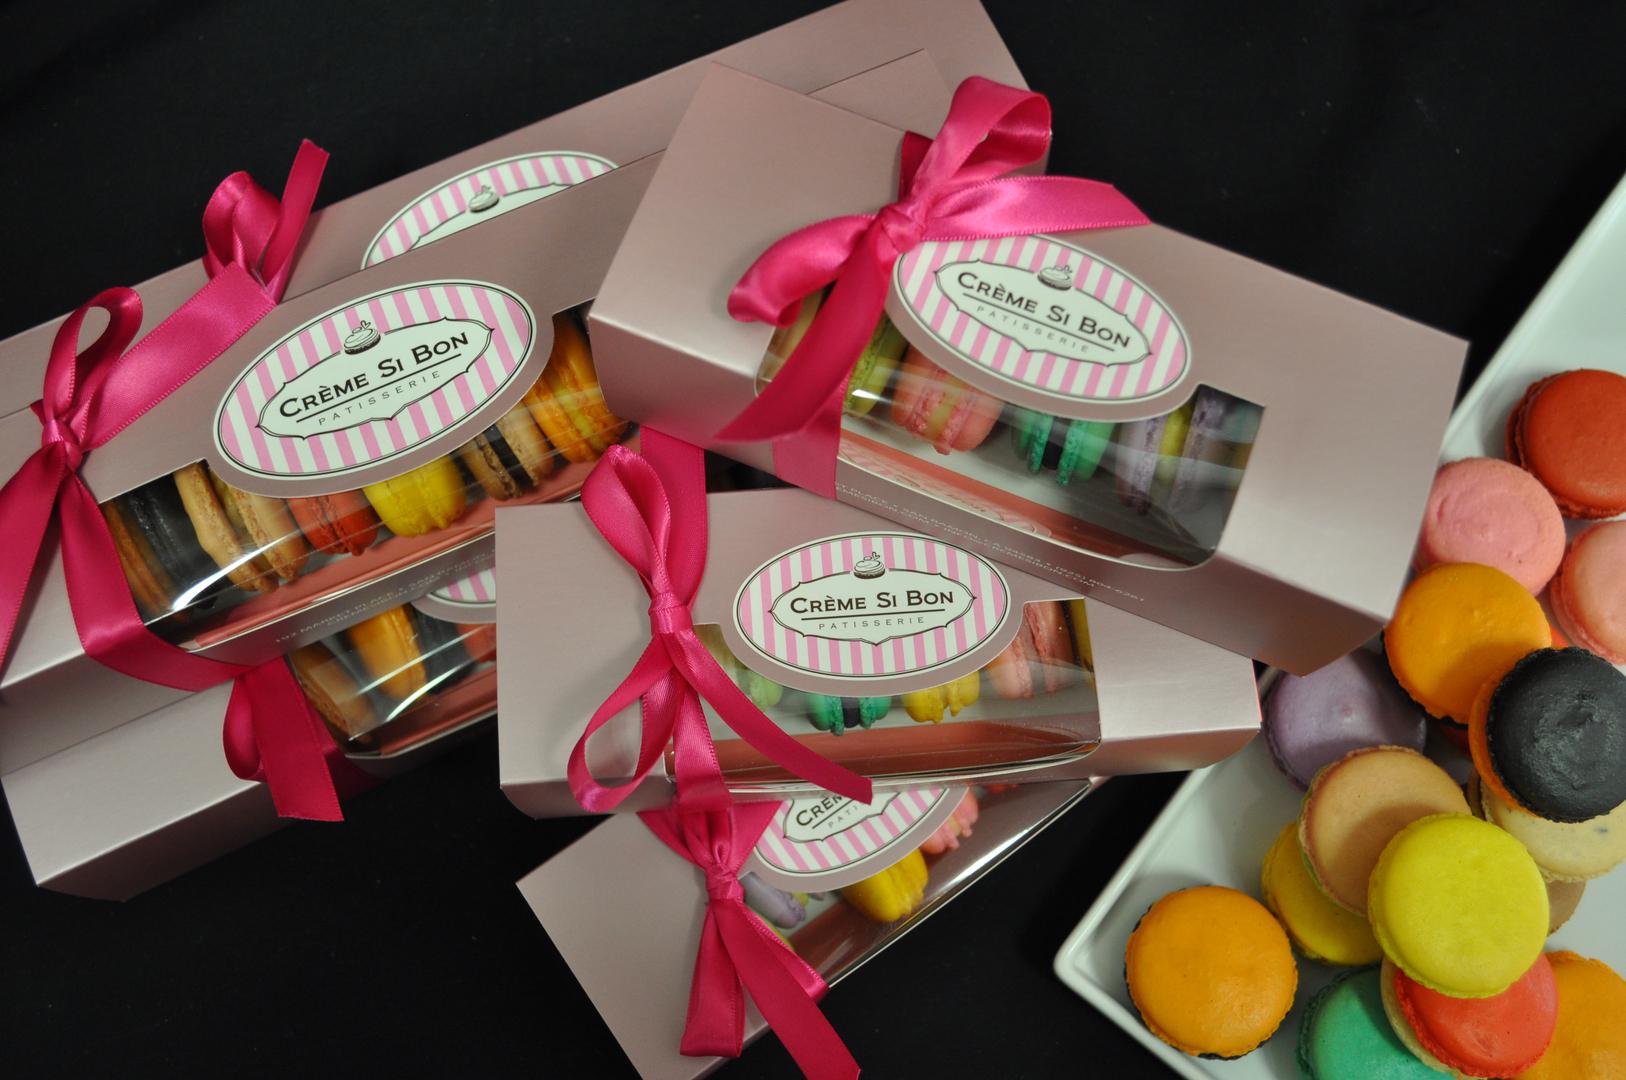 Macaron Gift Boxes Make Perfect Gifts.jpg